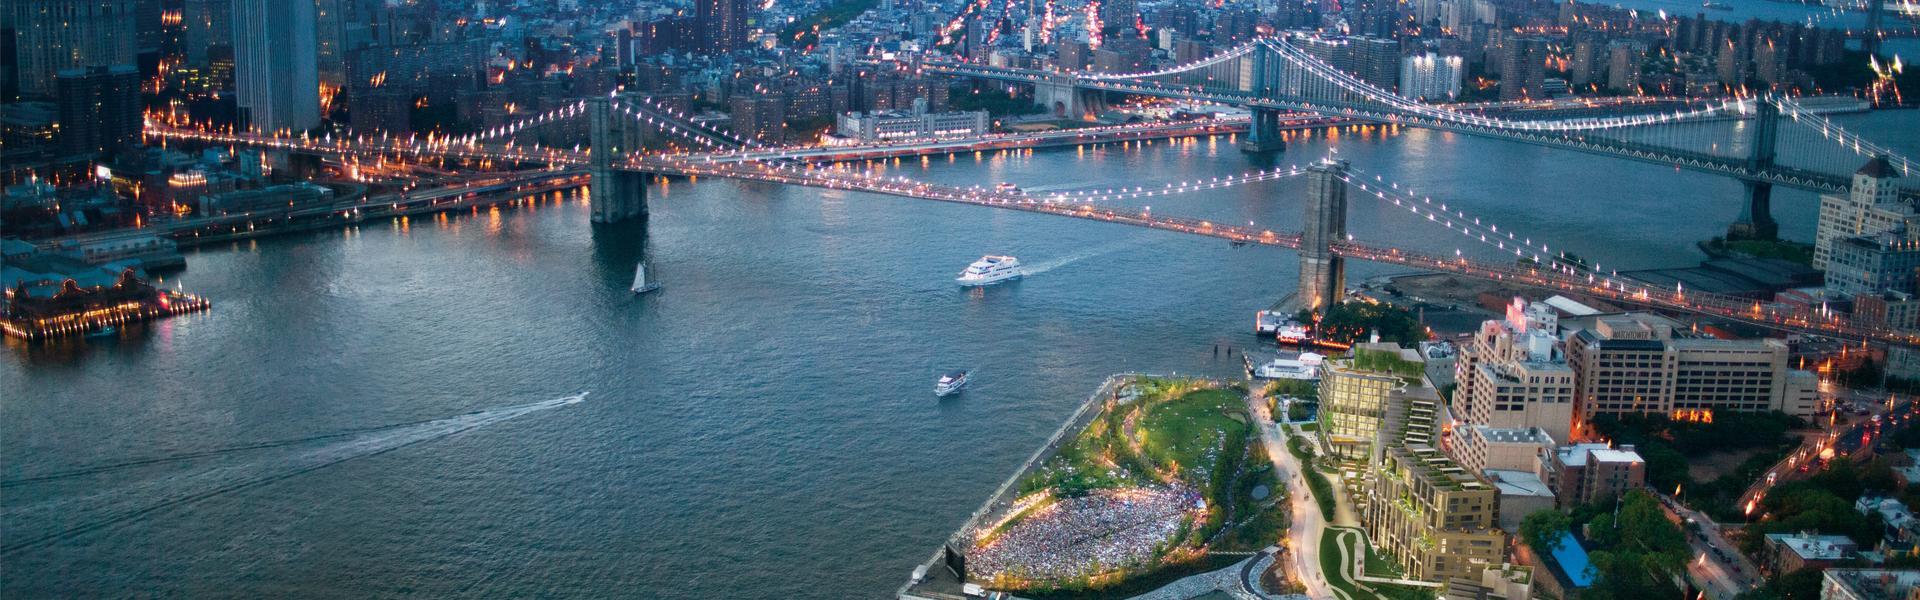 1-Hotel-Brooklyn-Bridge-NYC-Aerial-View